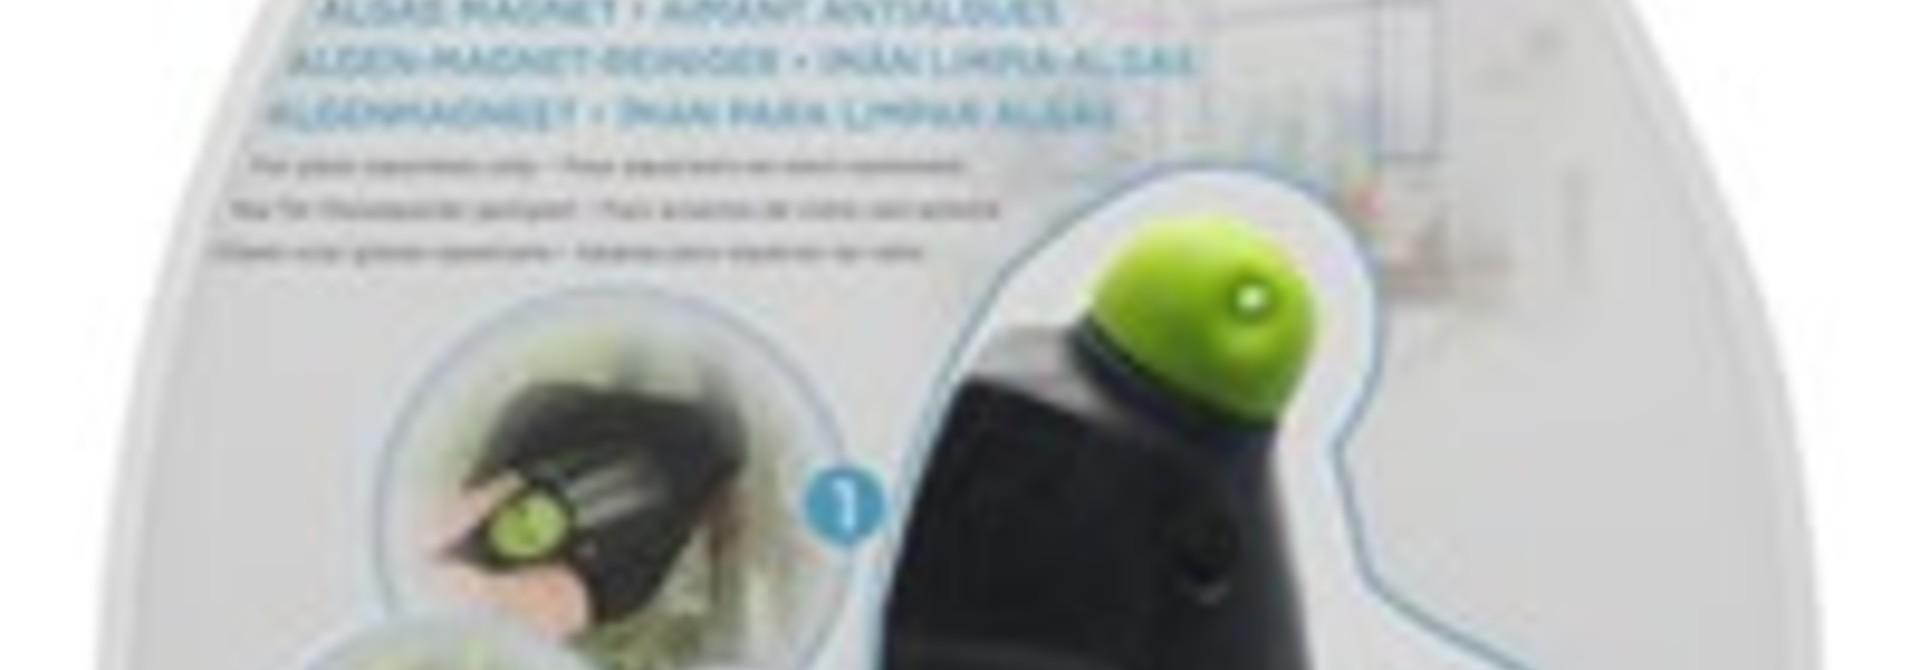 Fluval Algae Magnet Cleaner Medium